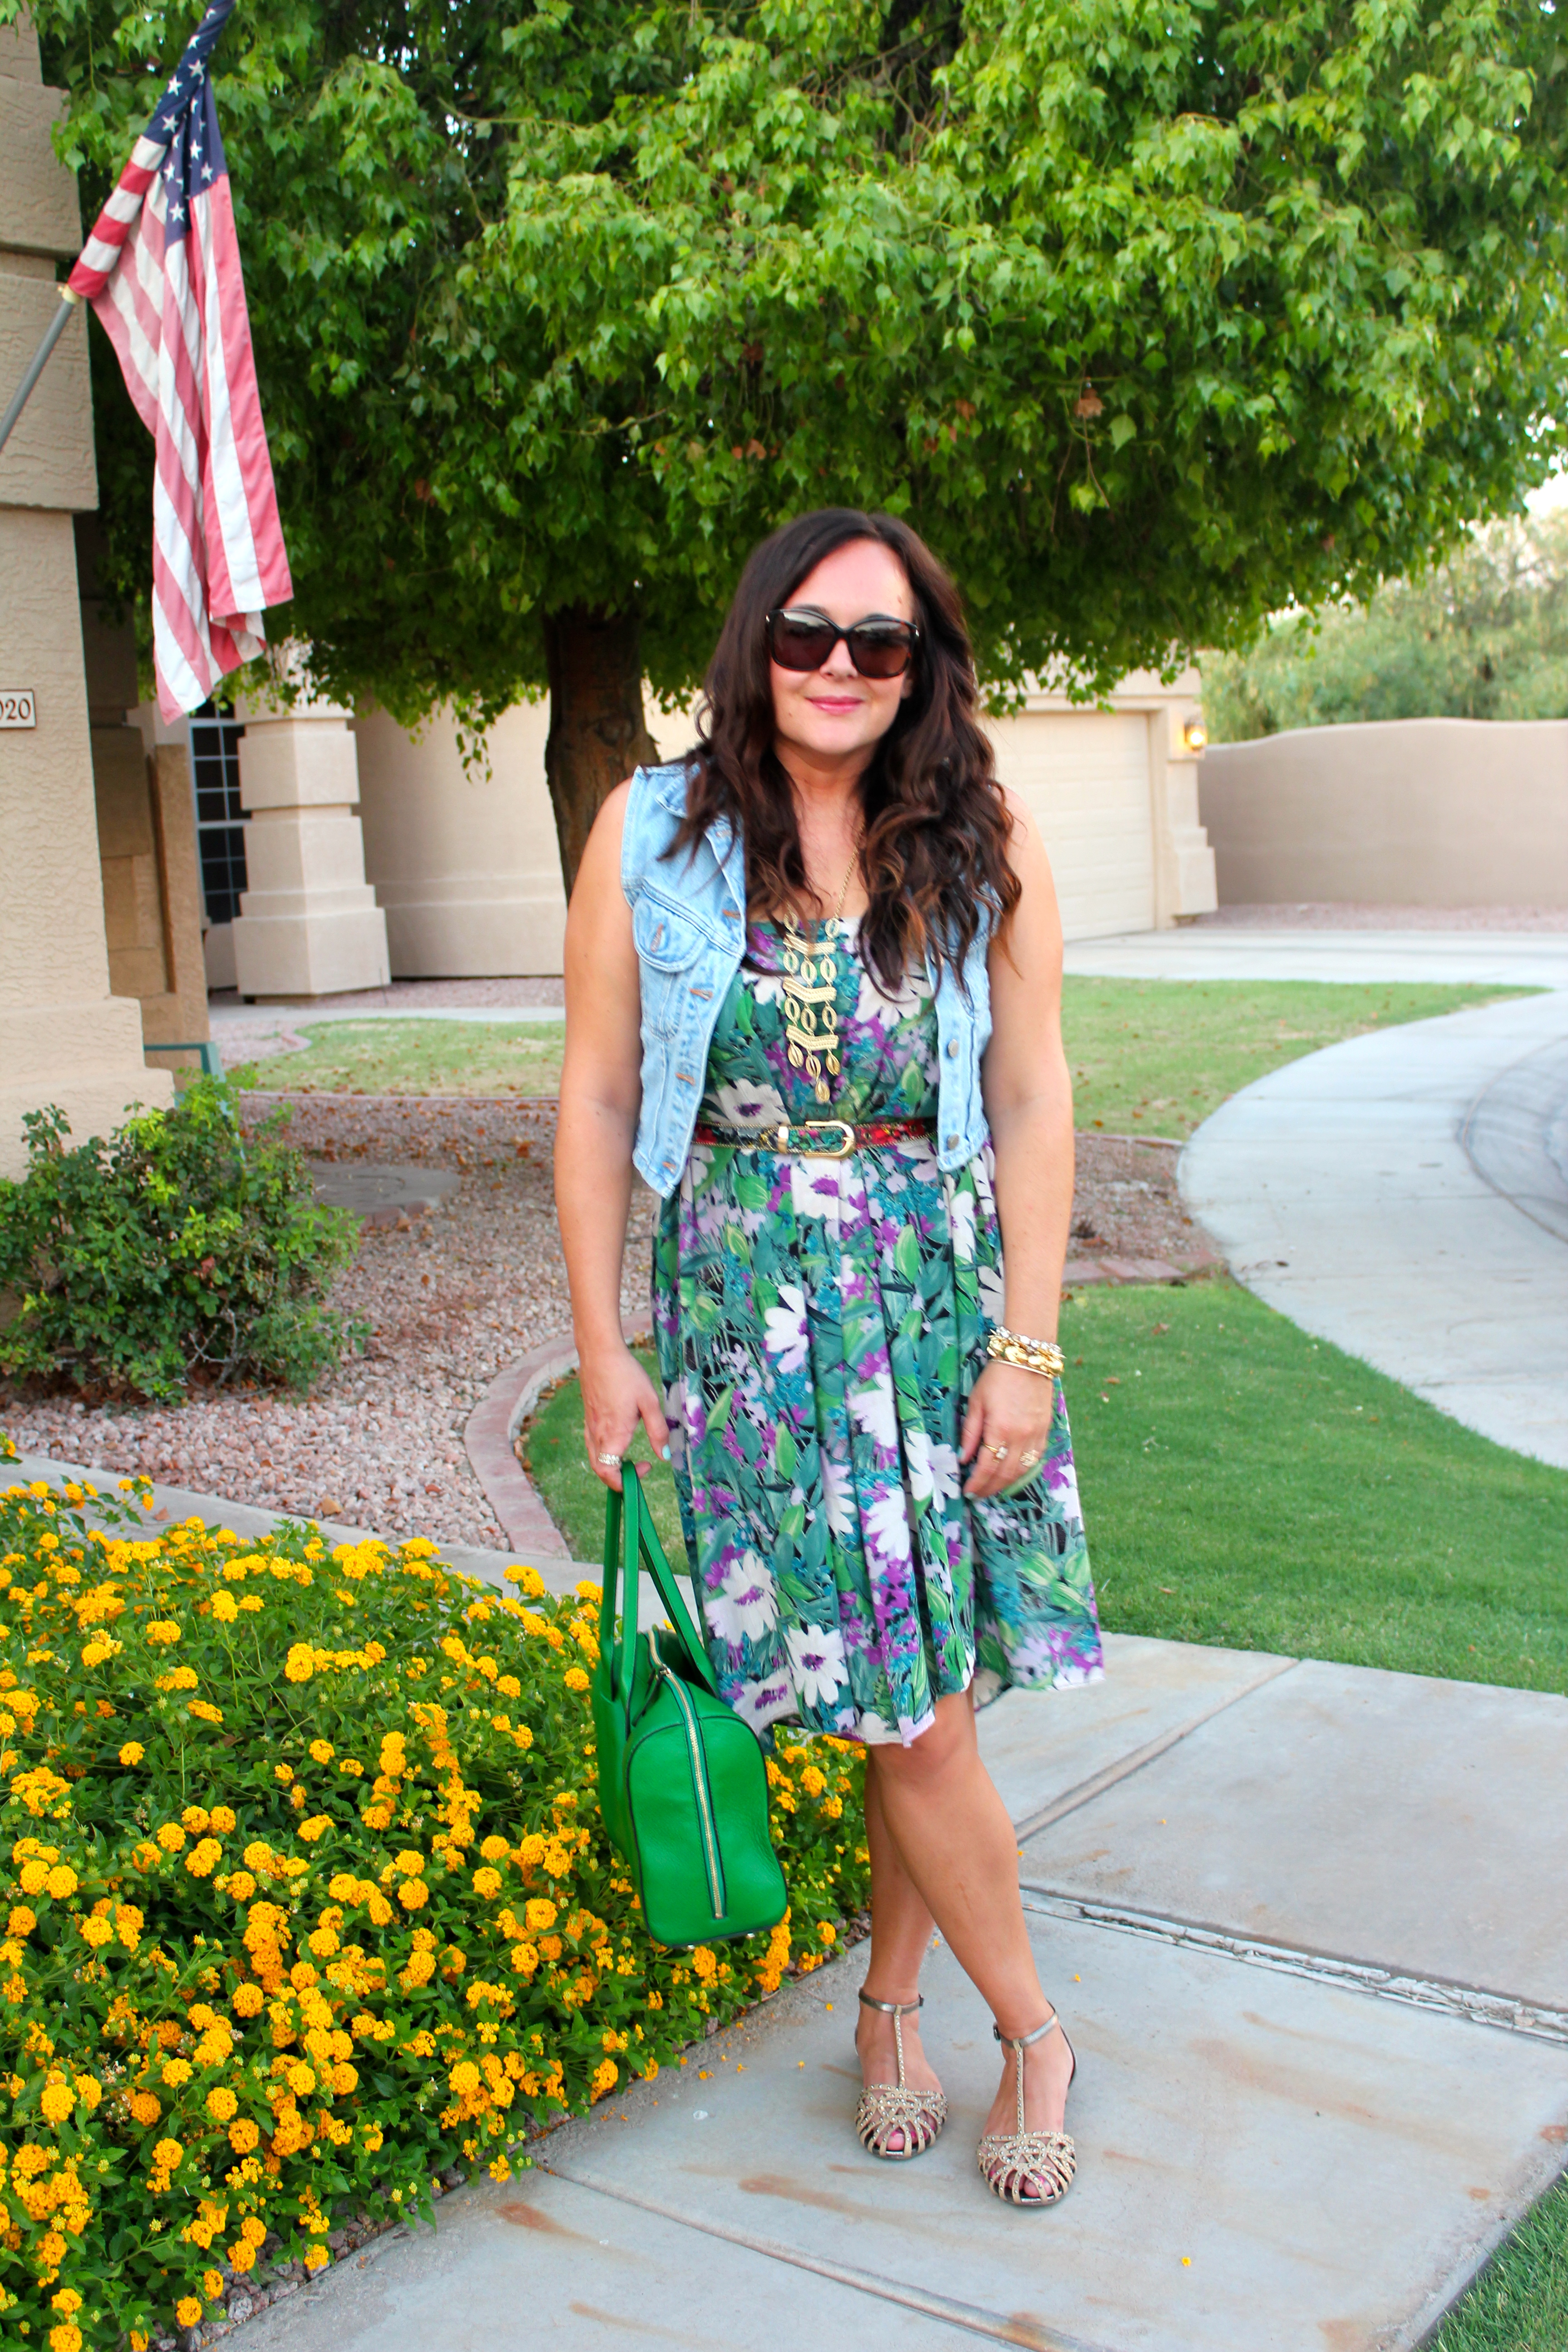 green kate spade bag